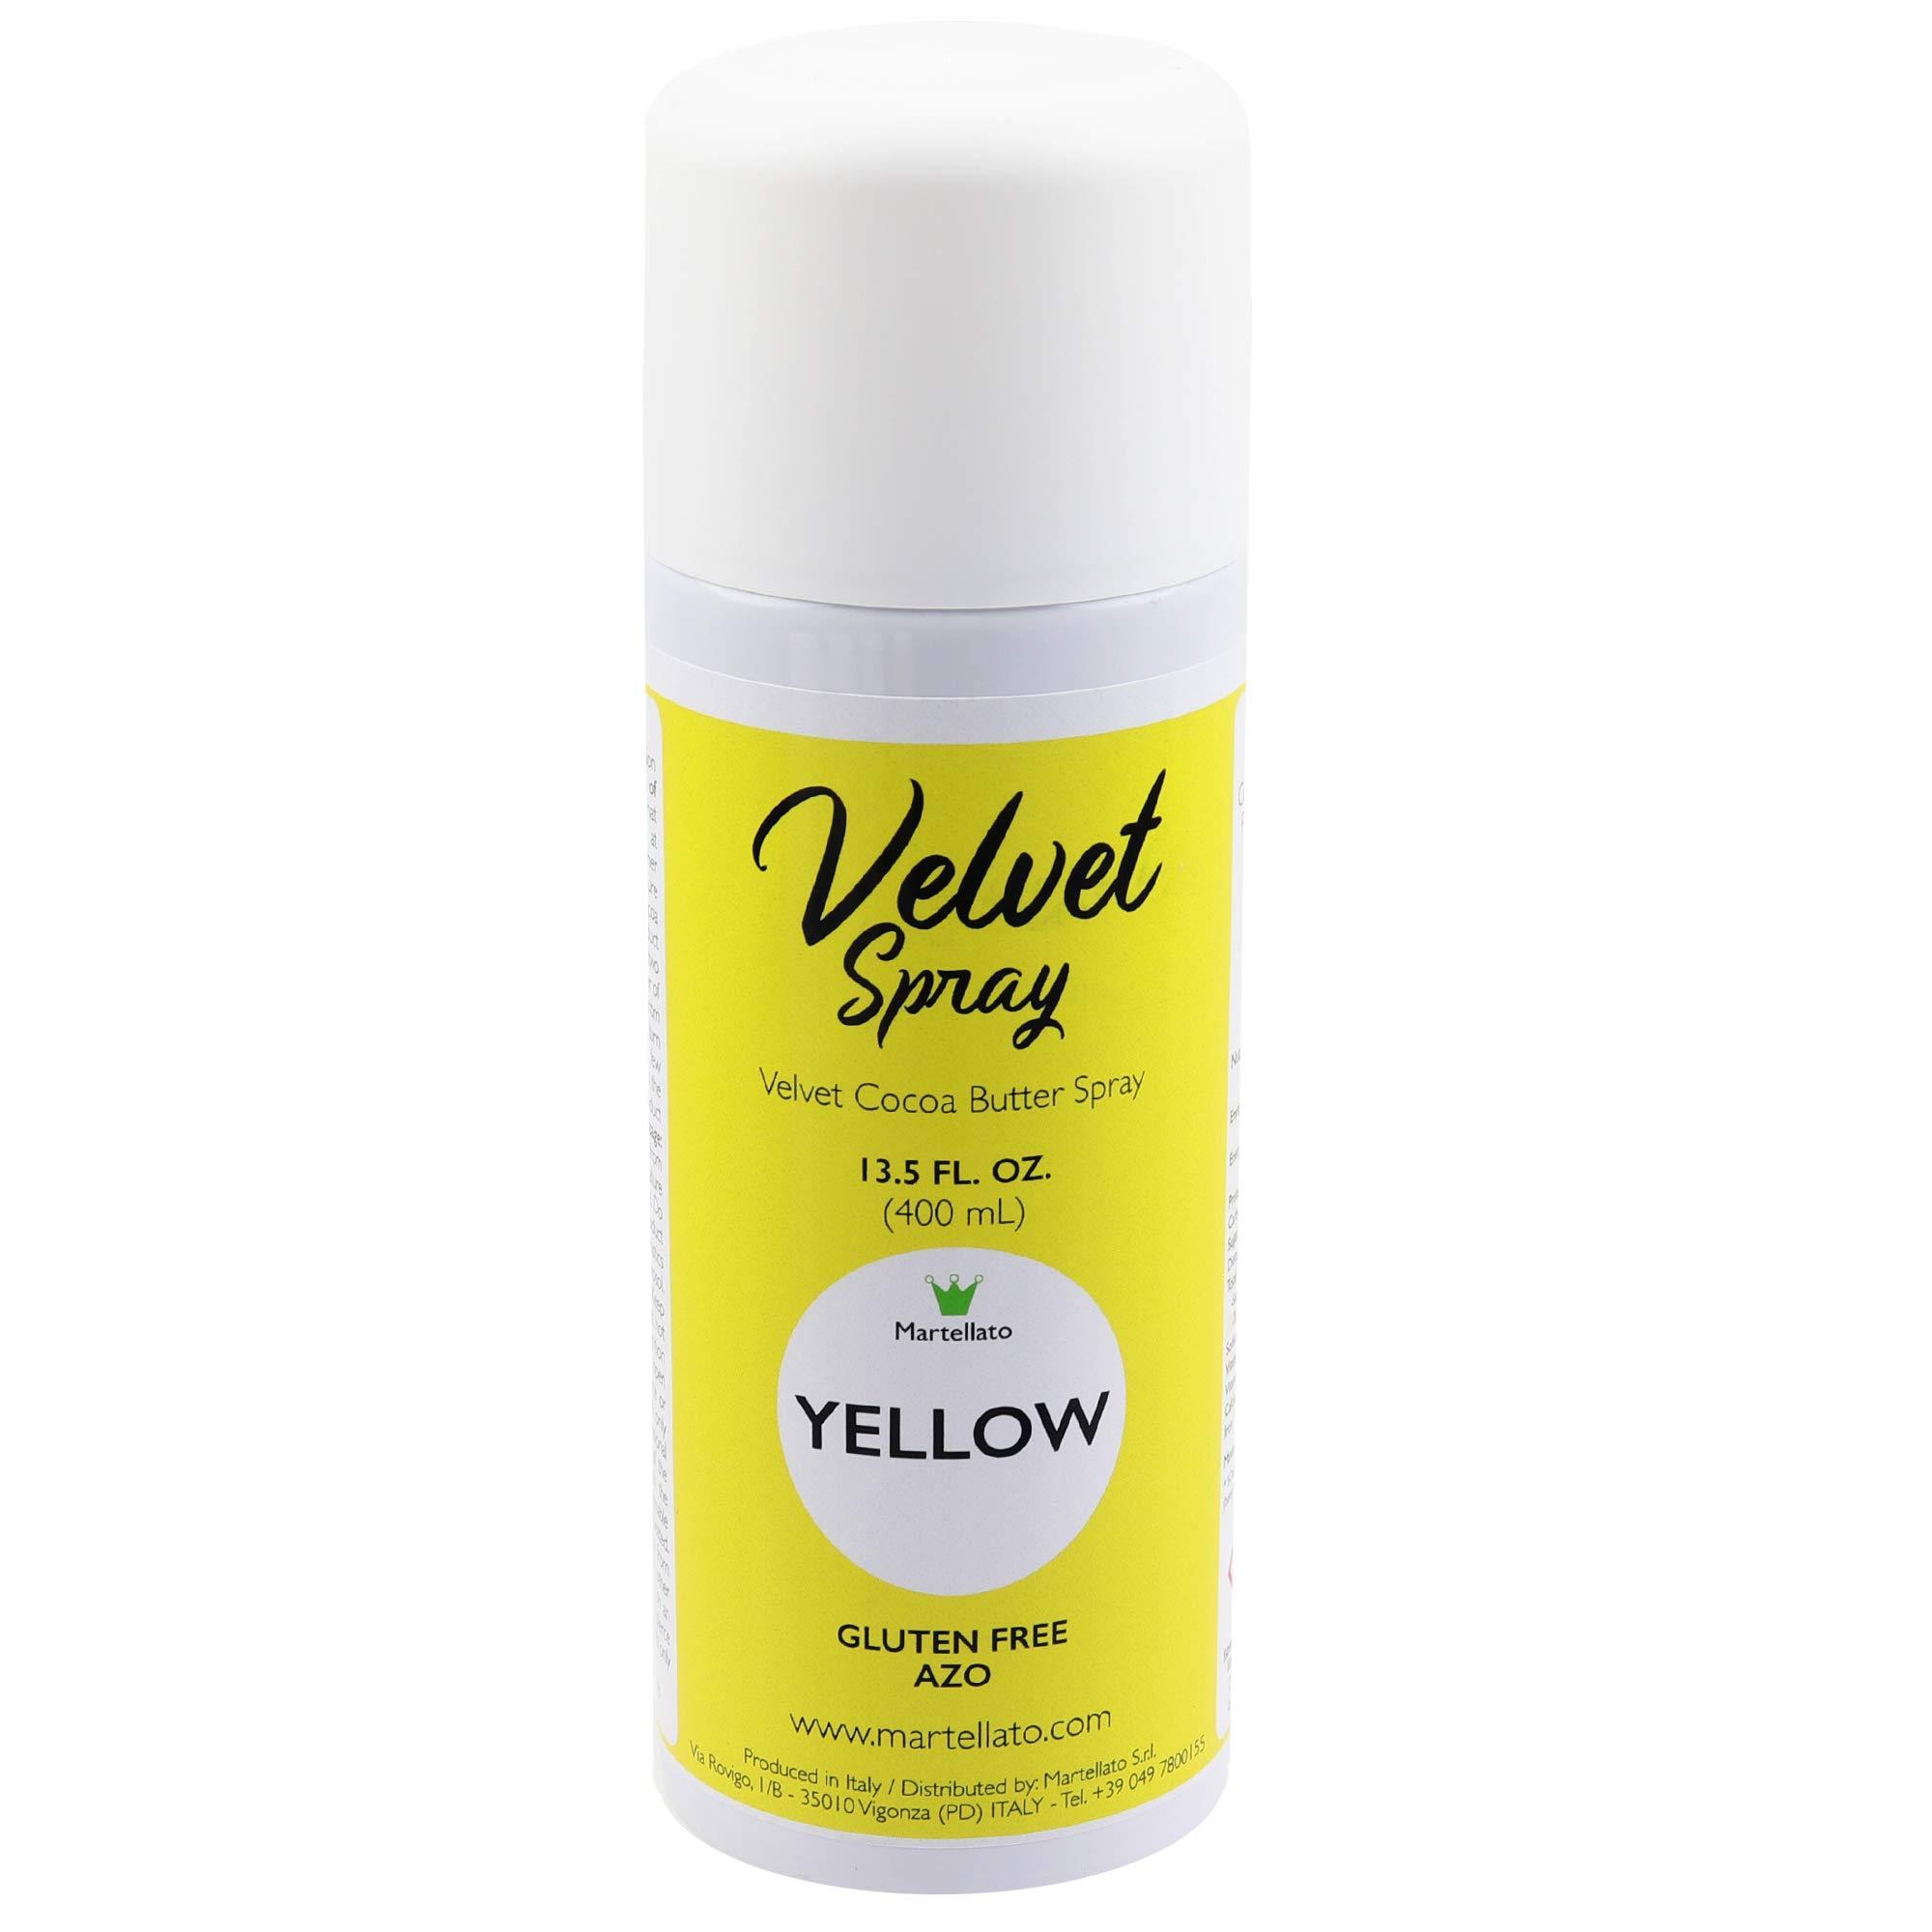 Martellato Yellow Velvet Spray 13.5 Ounce (400ml) by Martellato